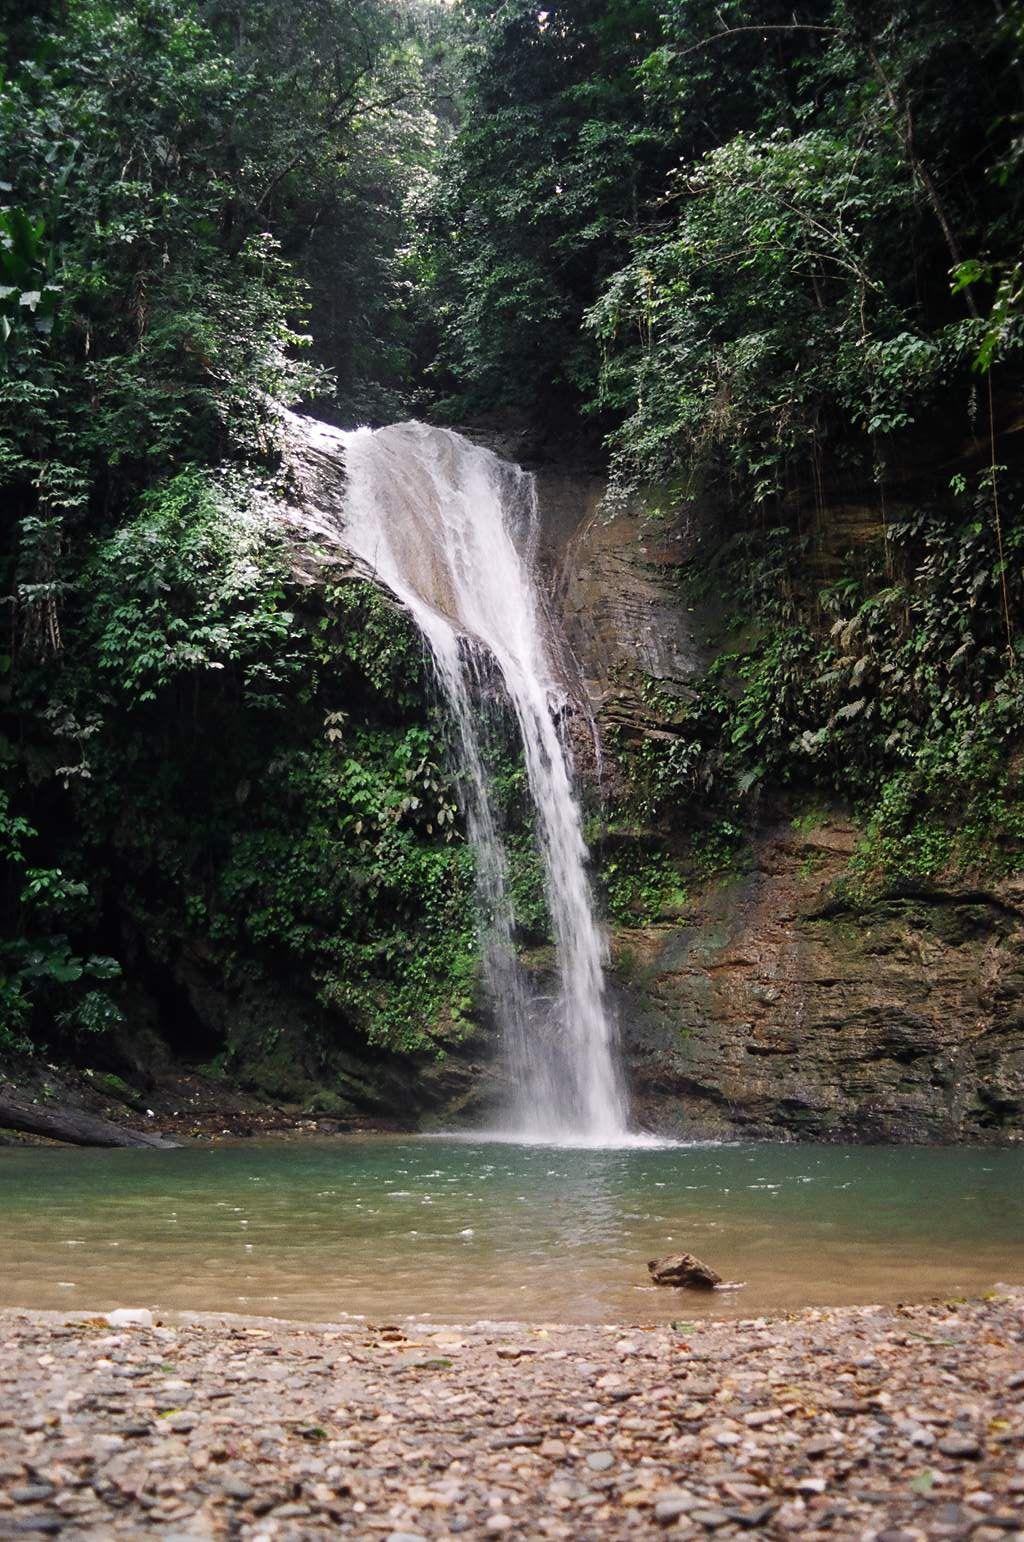 Dive in: The Caribbean's most beautiful waterfalls  Trinidad And Tobago Maracas Falls